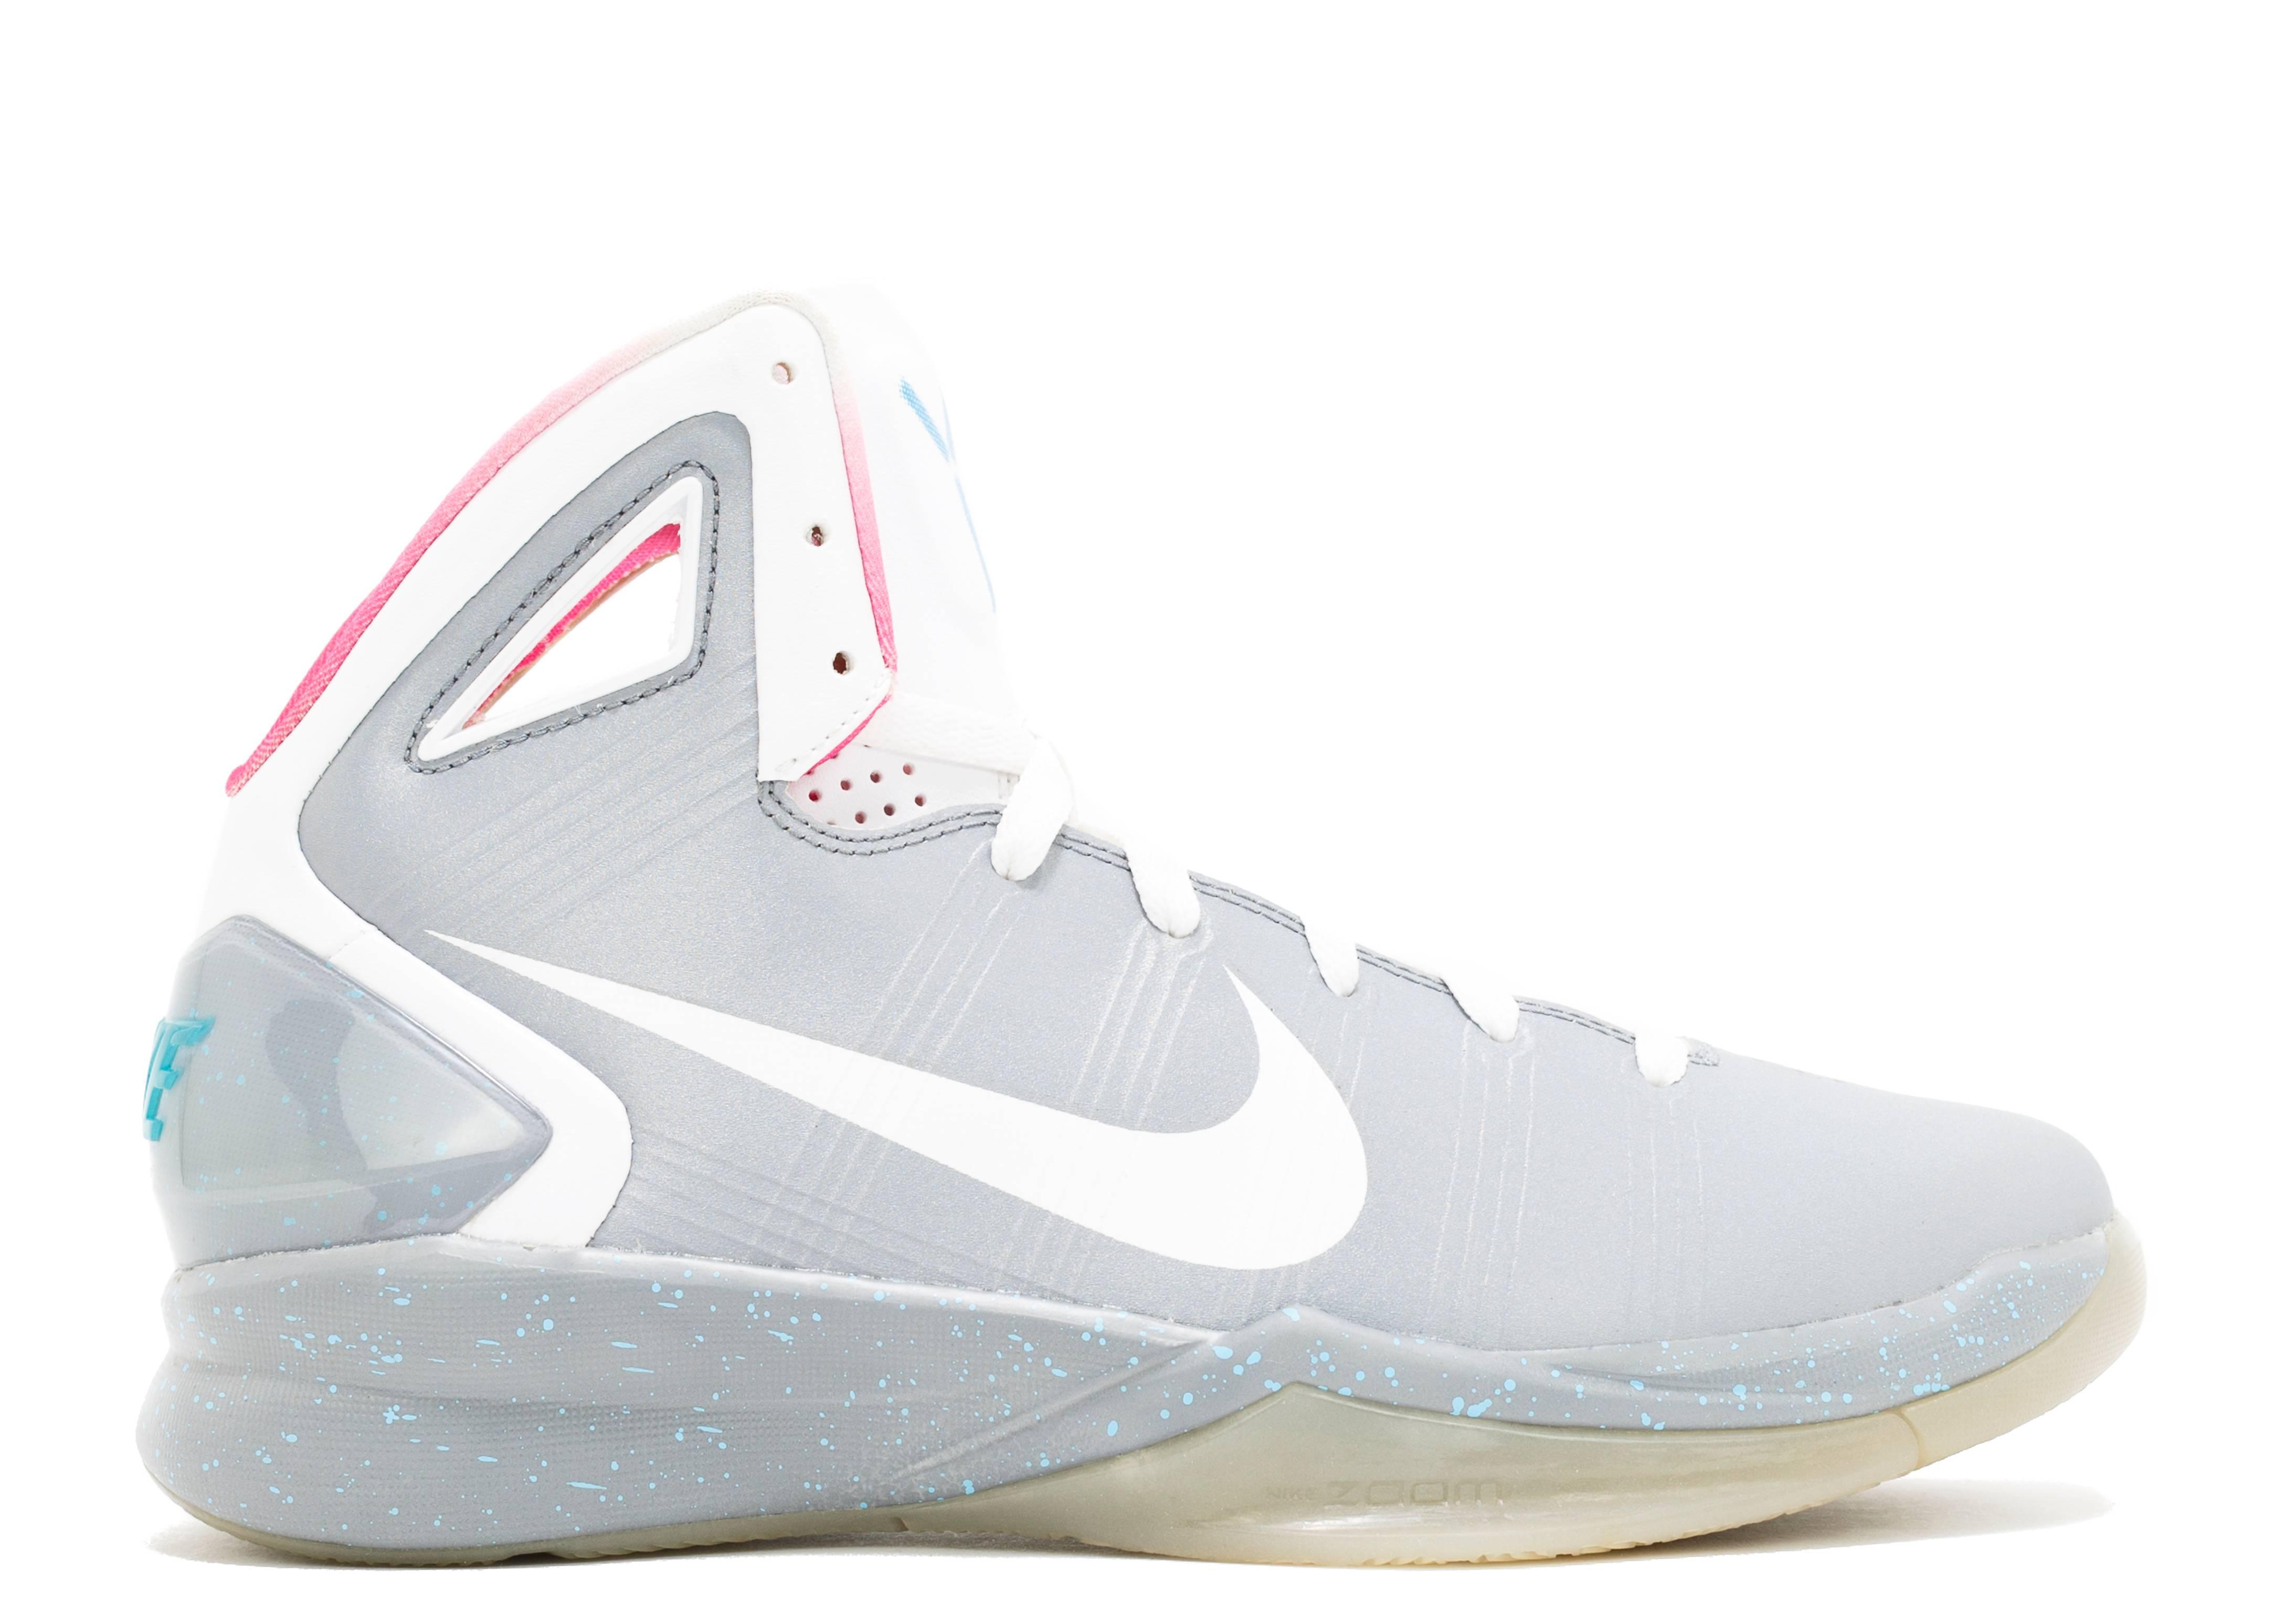 Nike Hyperdunk Marty McFly 2015